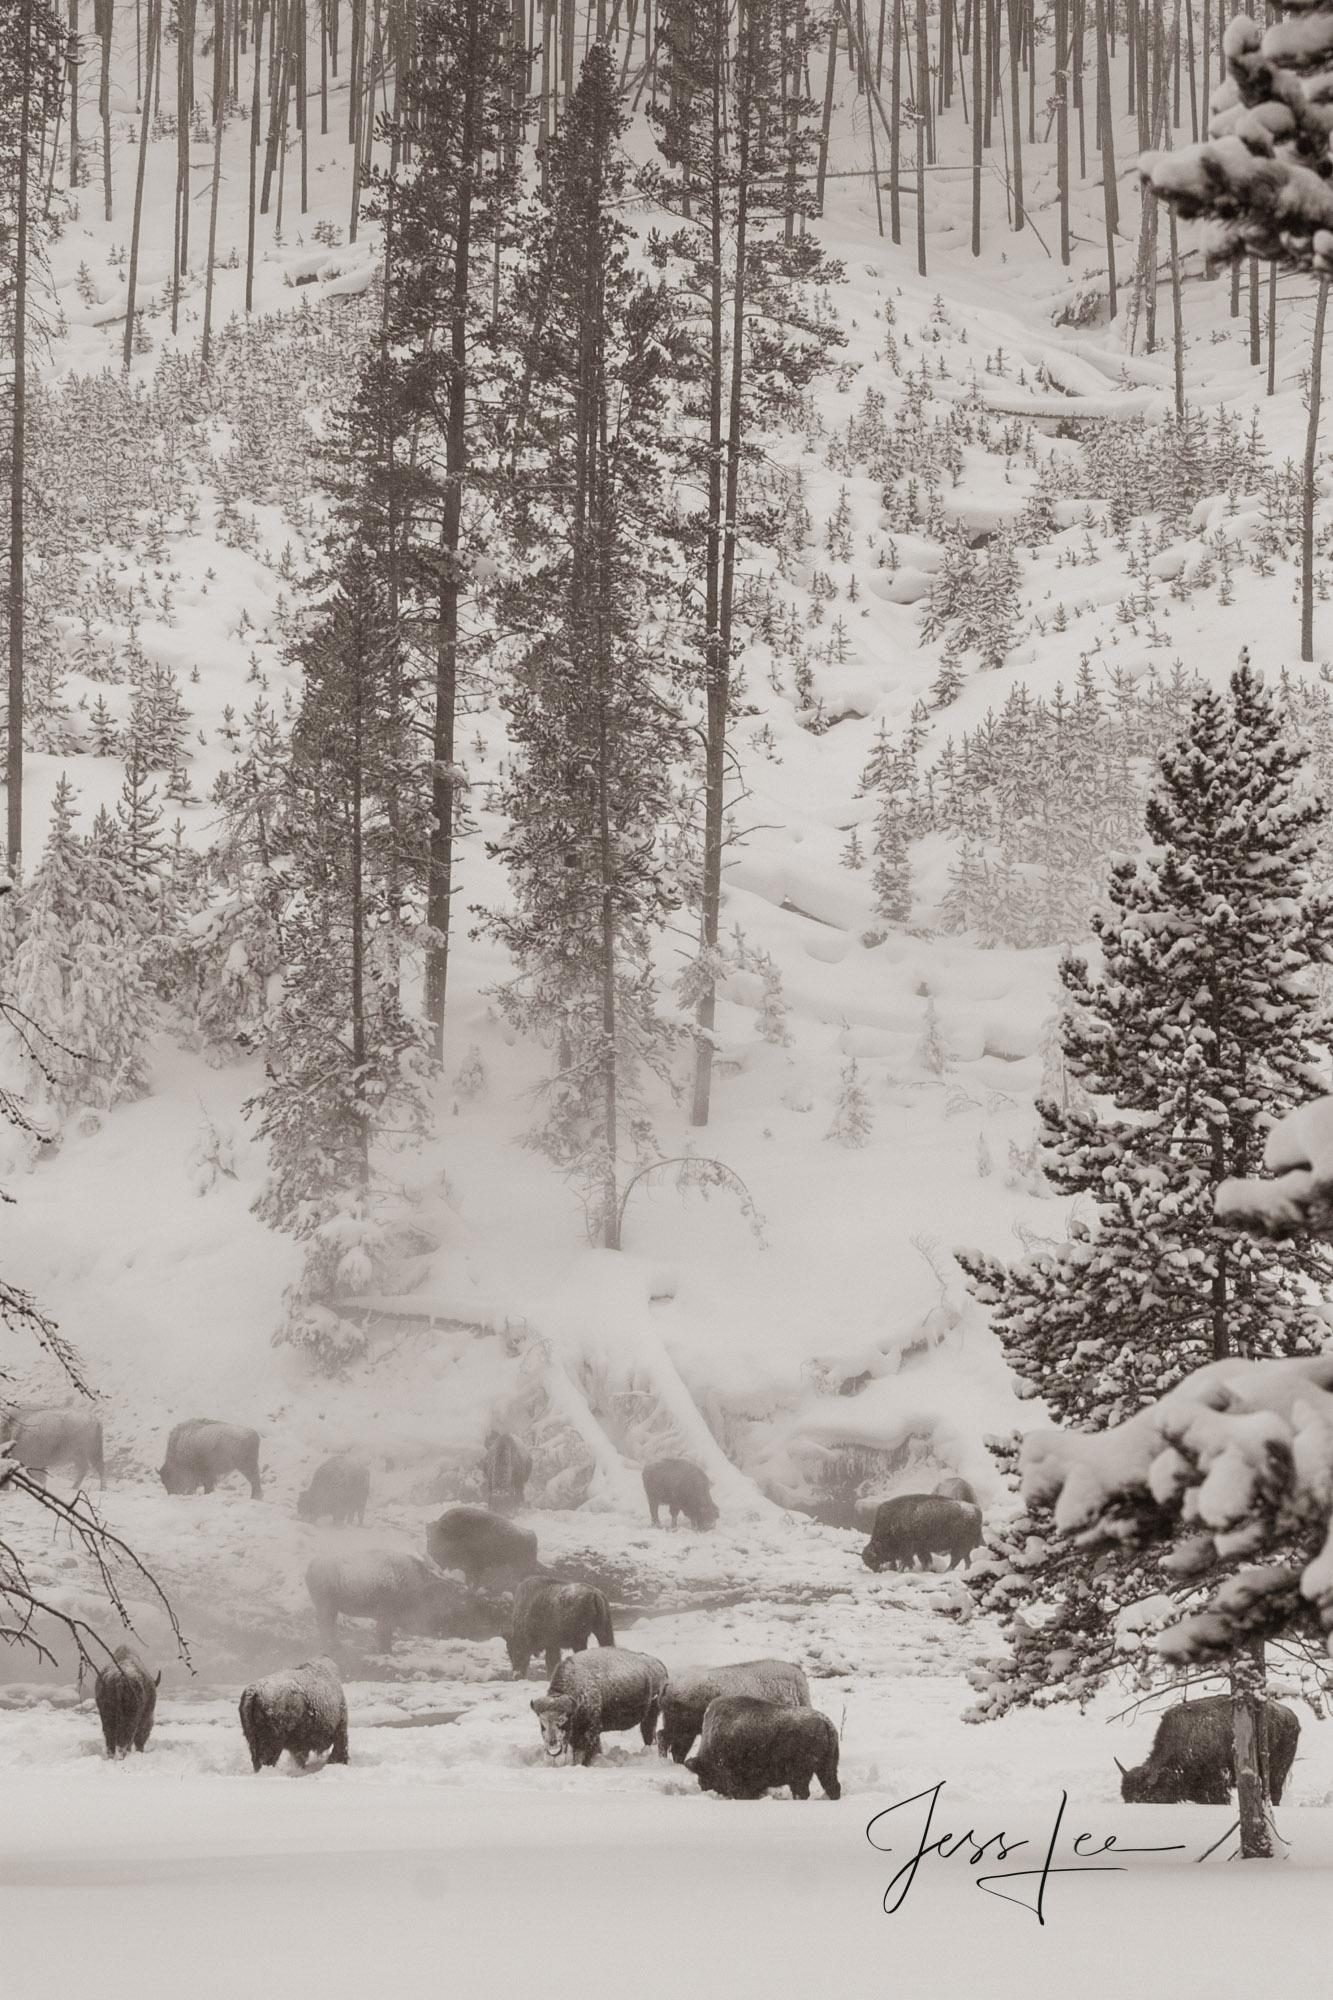 Bison herd at hot springs in winter, photo